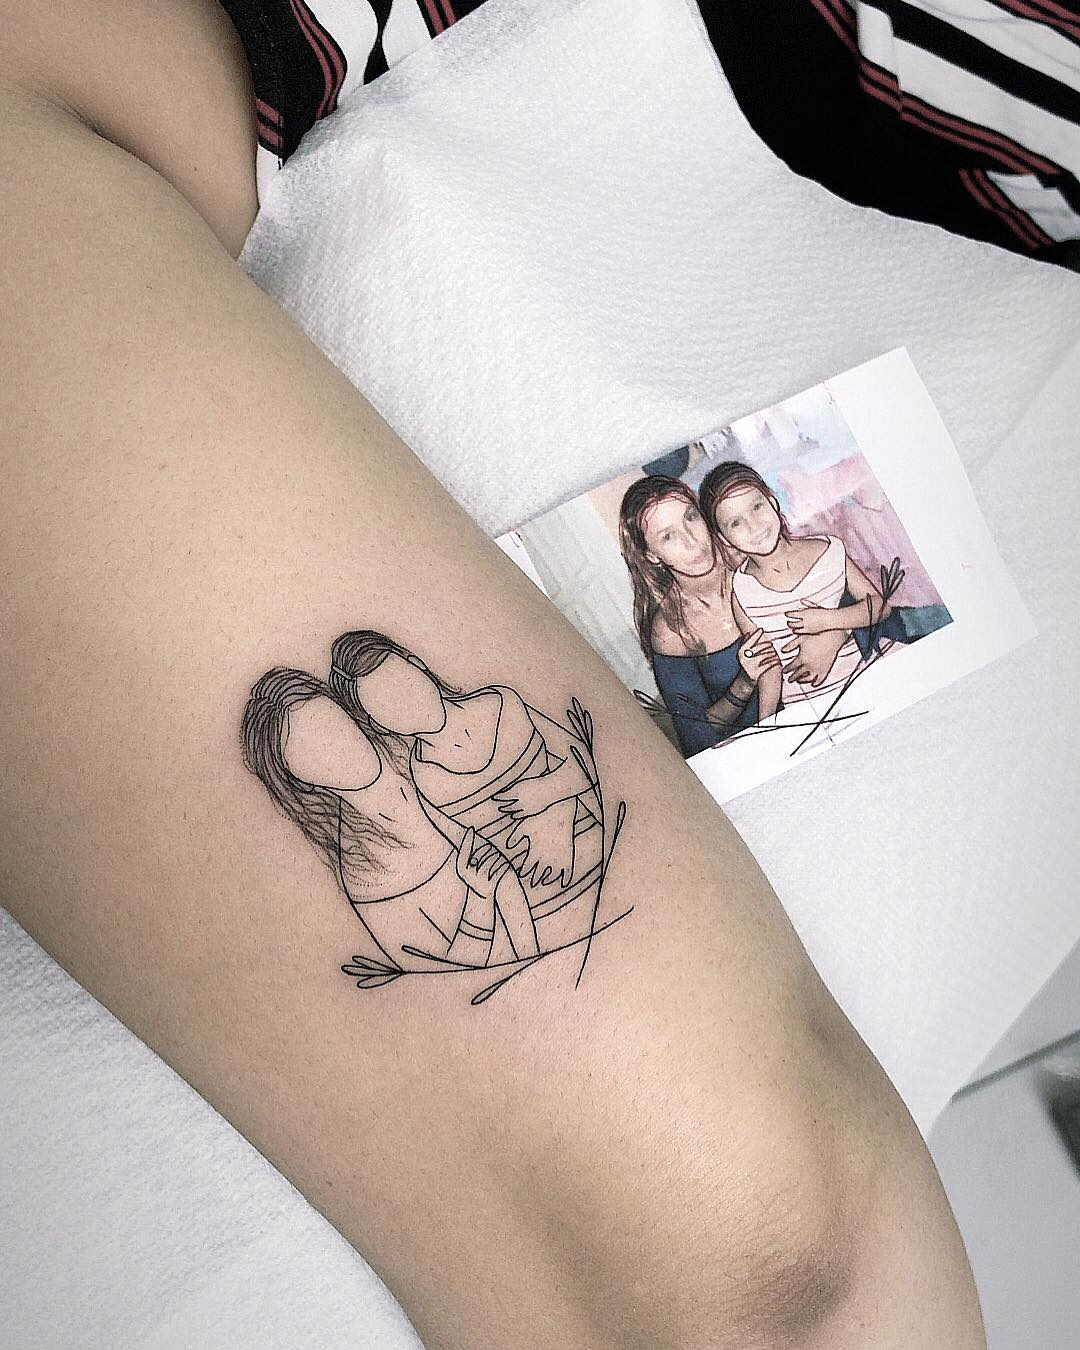 Татуировки в виде матери и ребёнка фото 1